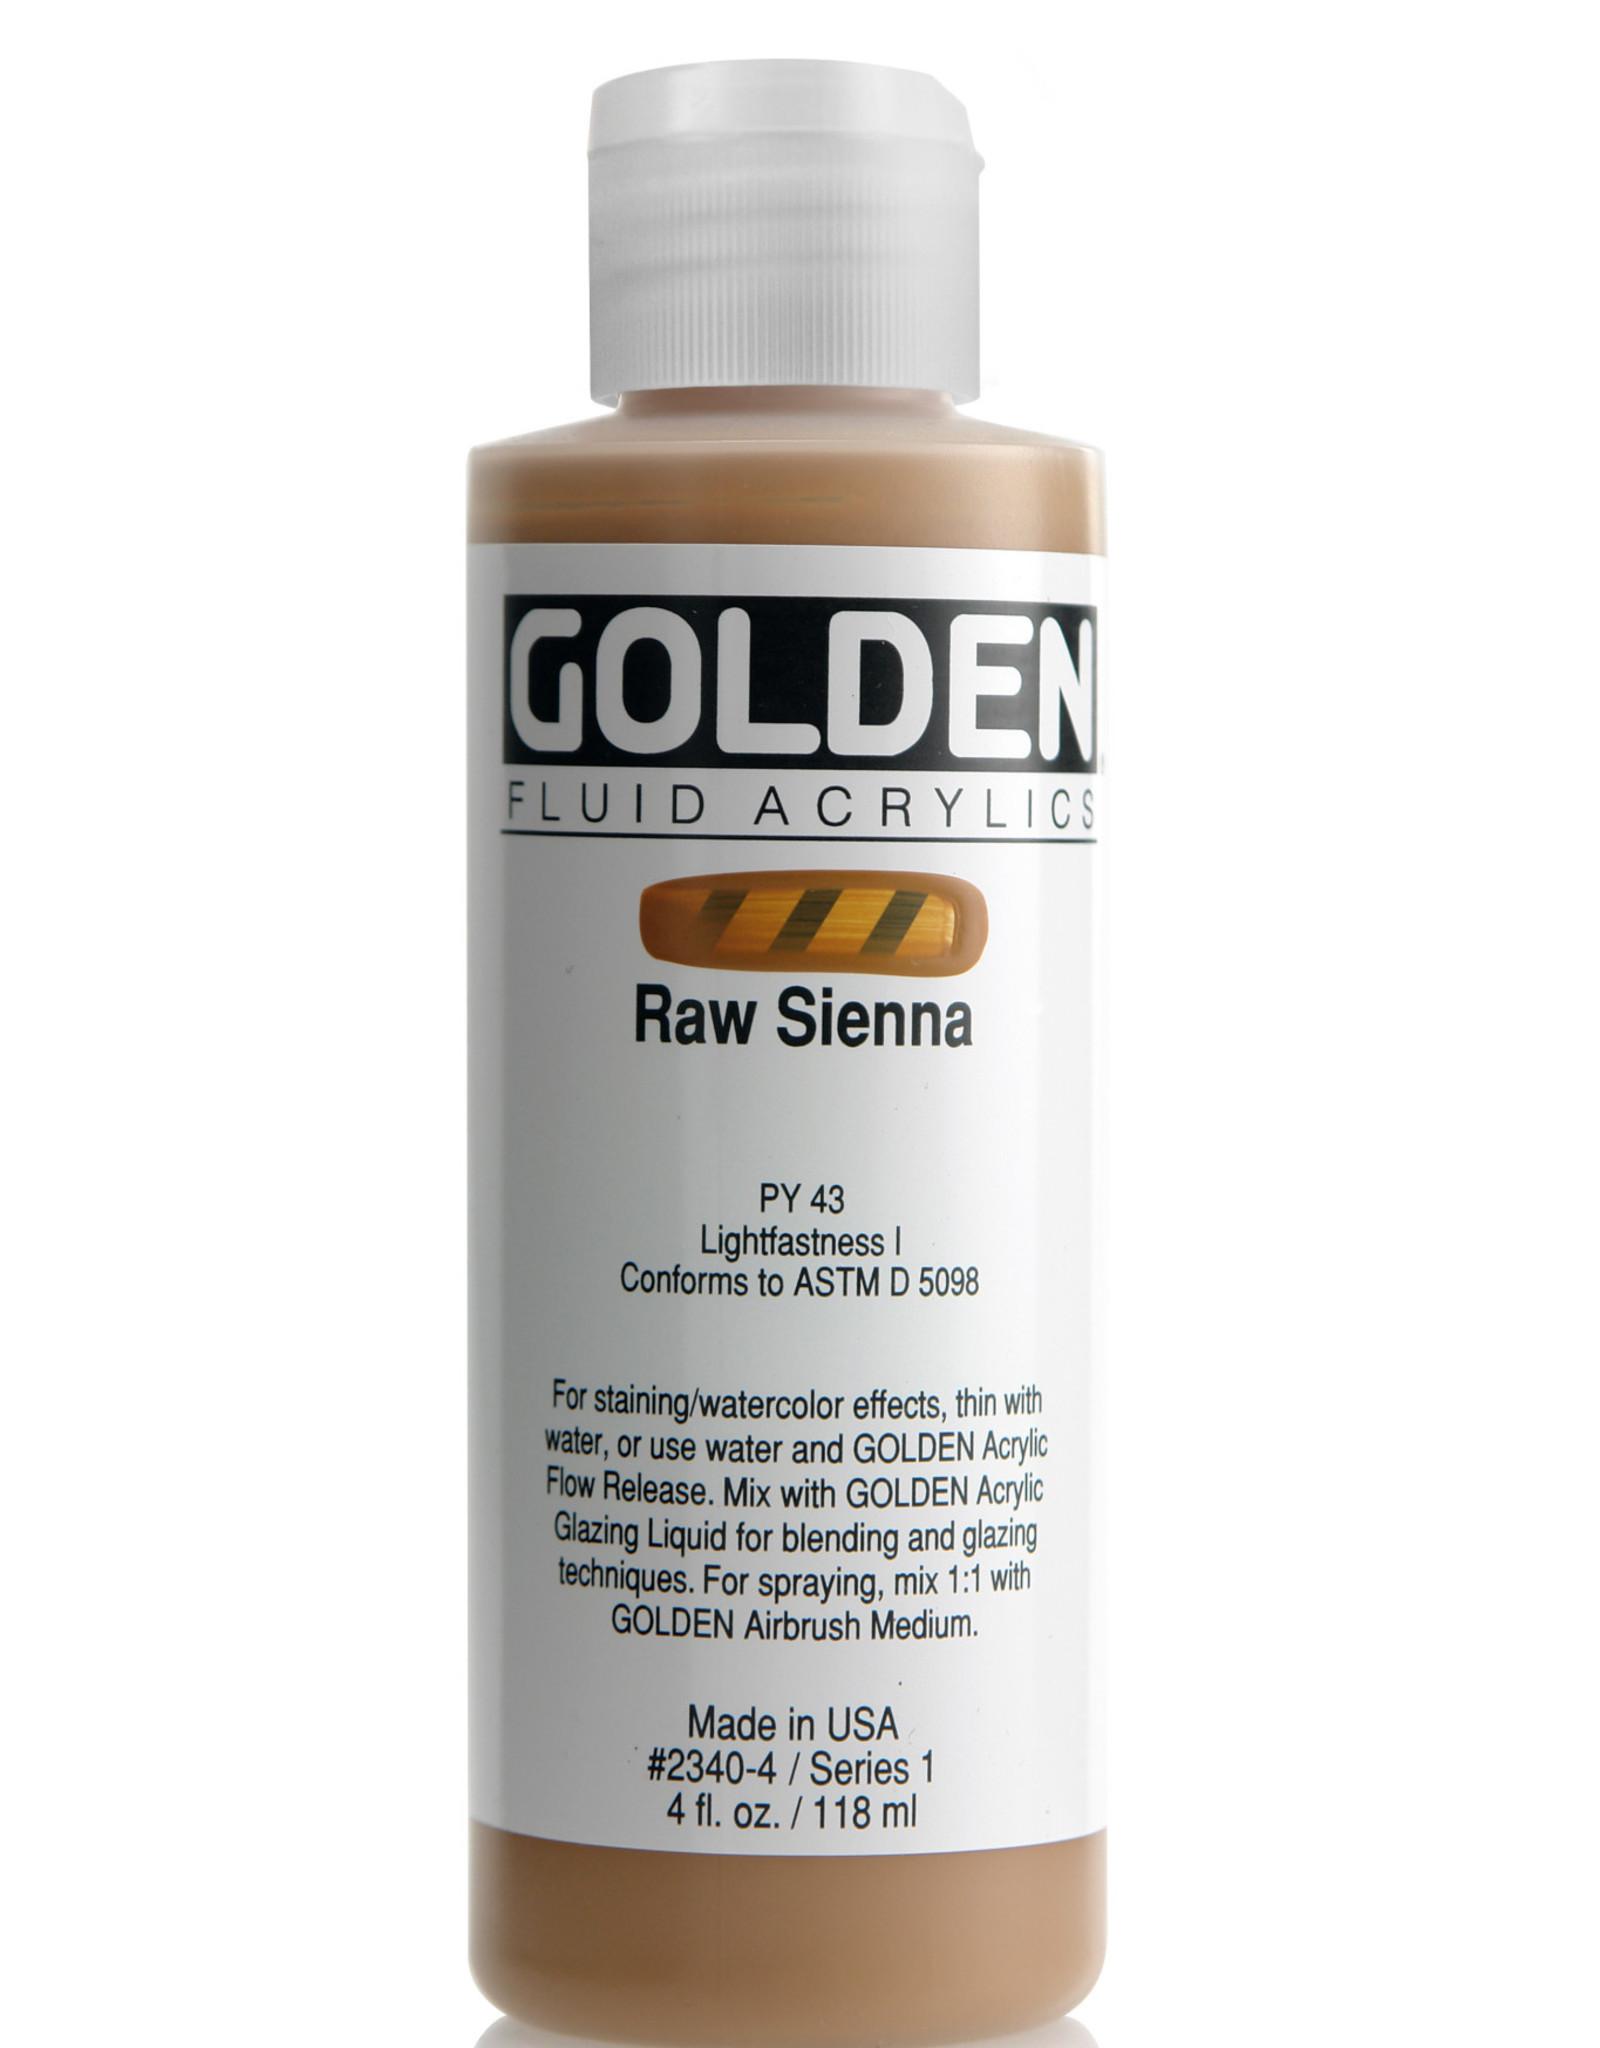 Golden Fluid Acrylic Paint, Raw Sienna, Series 1, 4fl.oz, Bottle